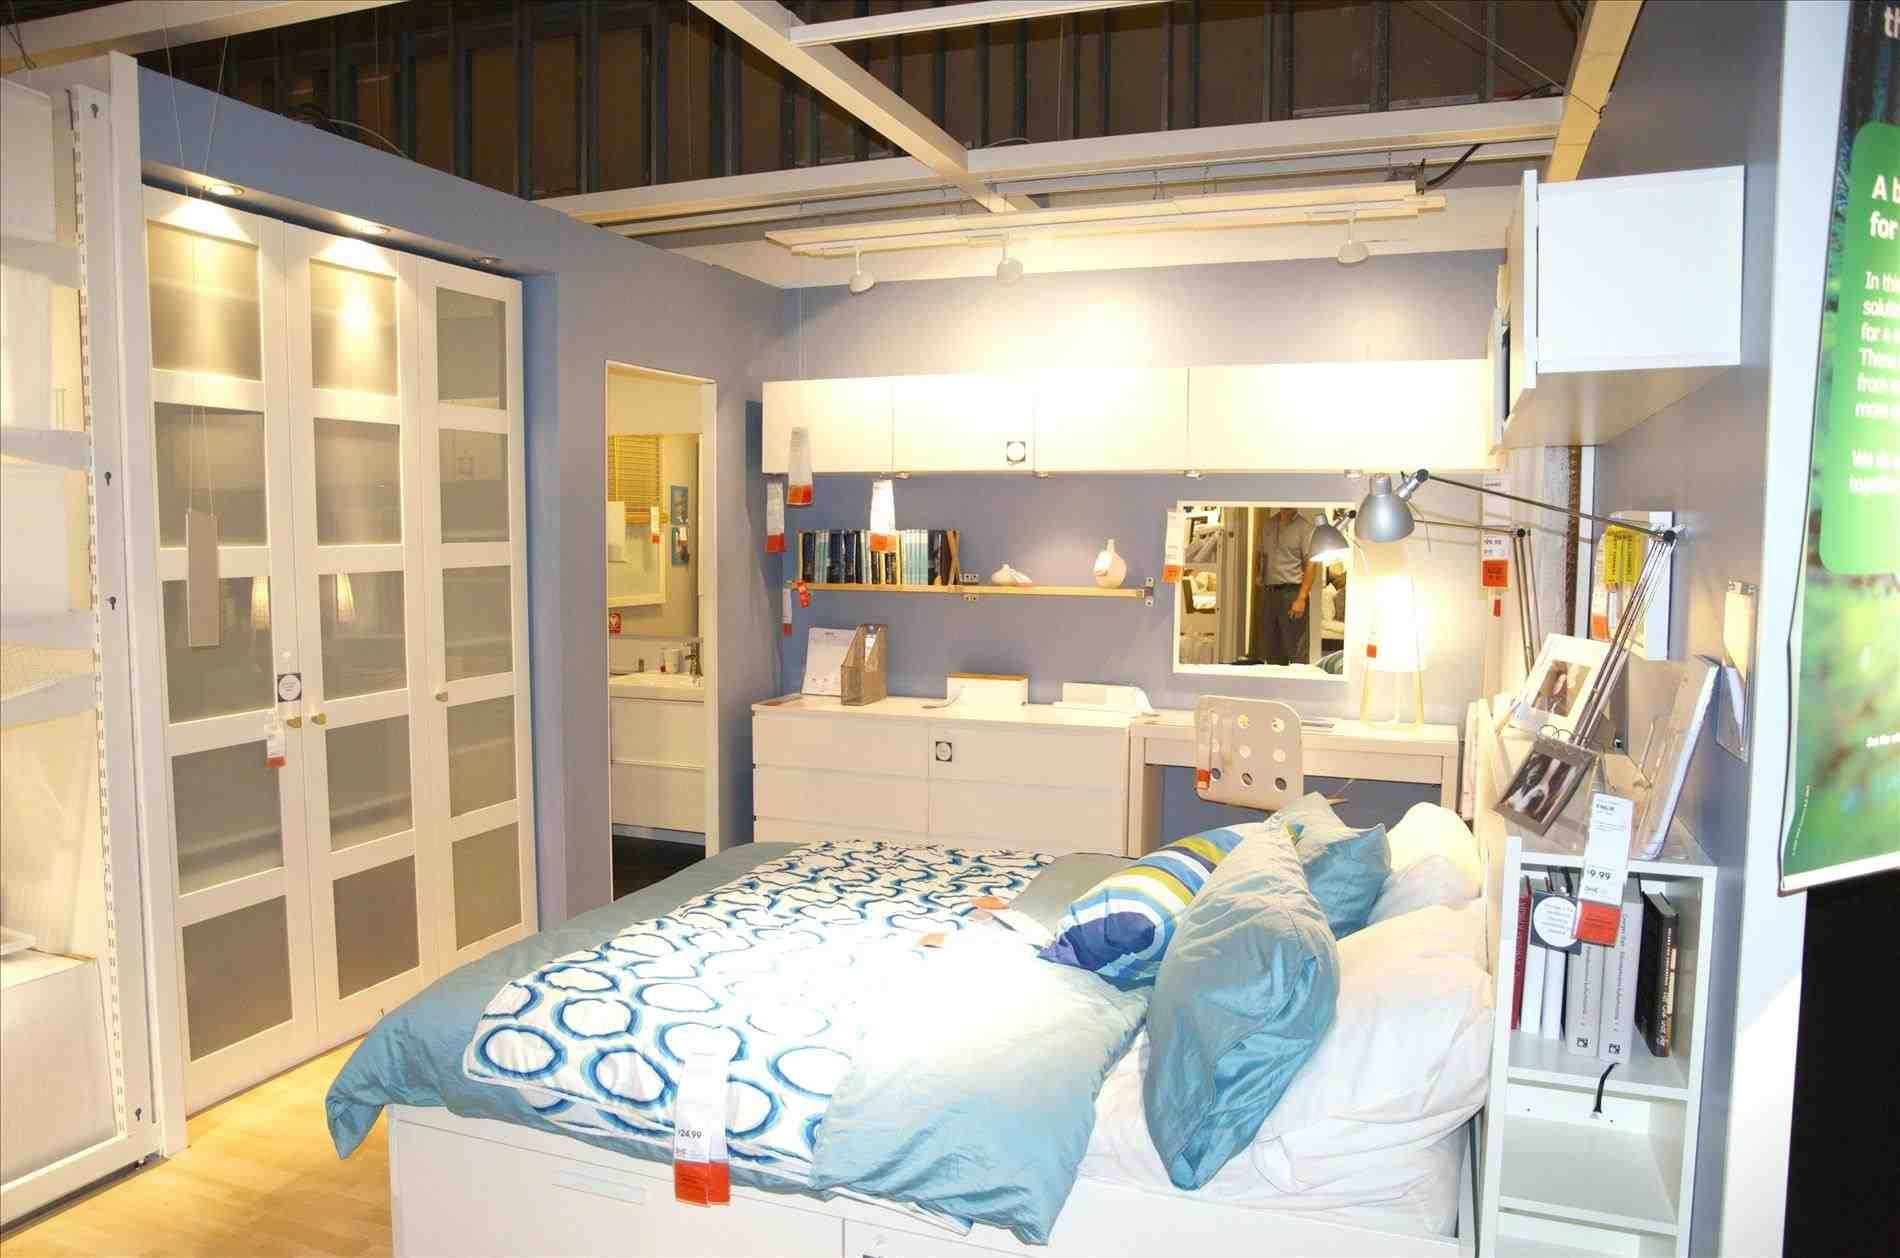 Small Garage Bedroom Ideas Small House Interior Design